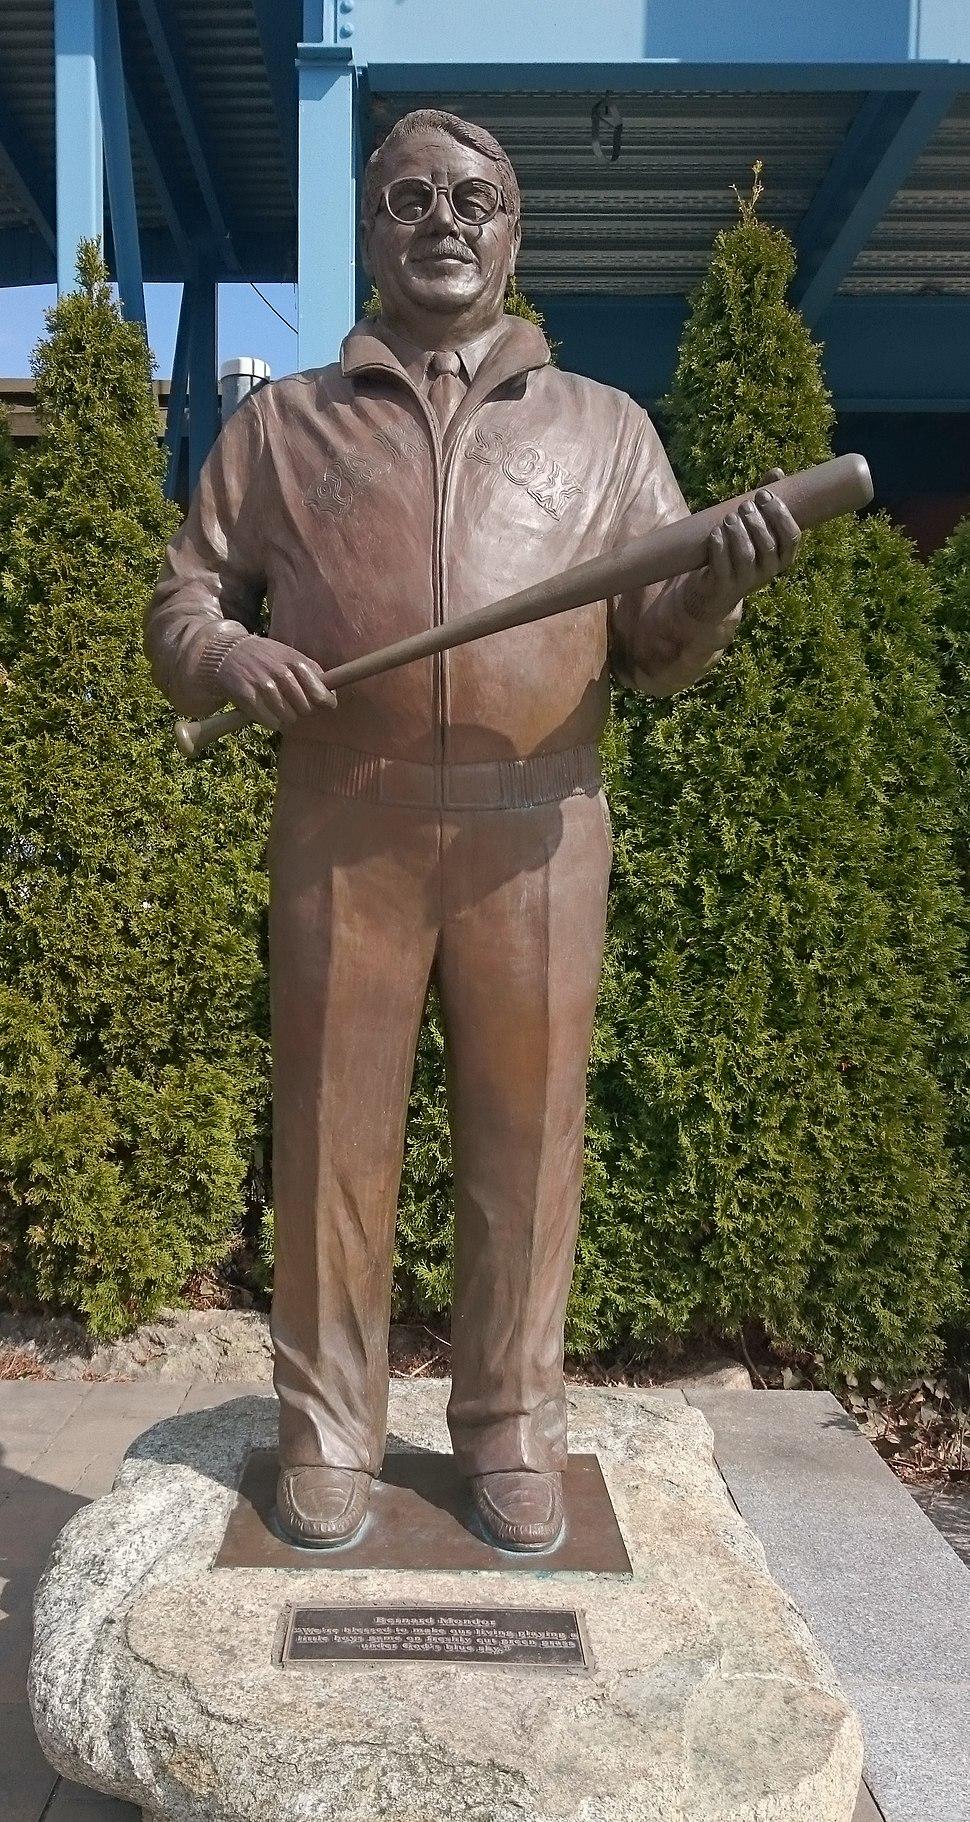 McCoy Stadium - Ben Mondor statue